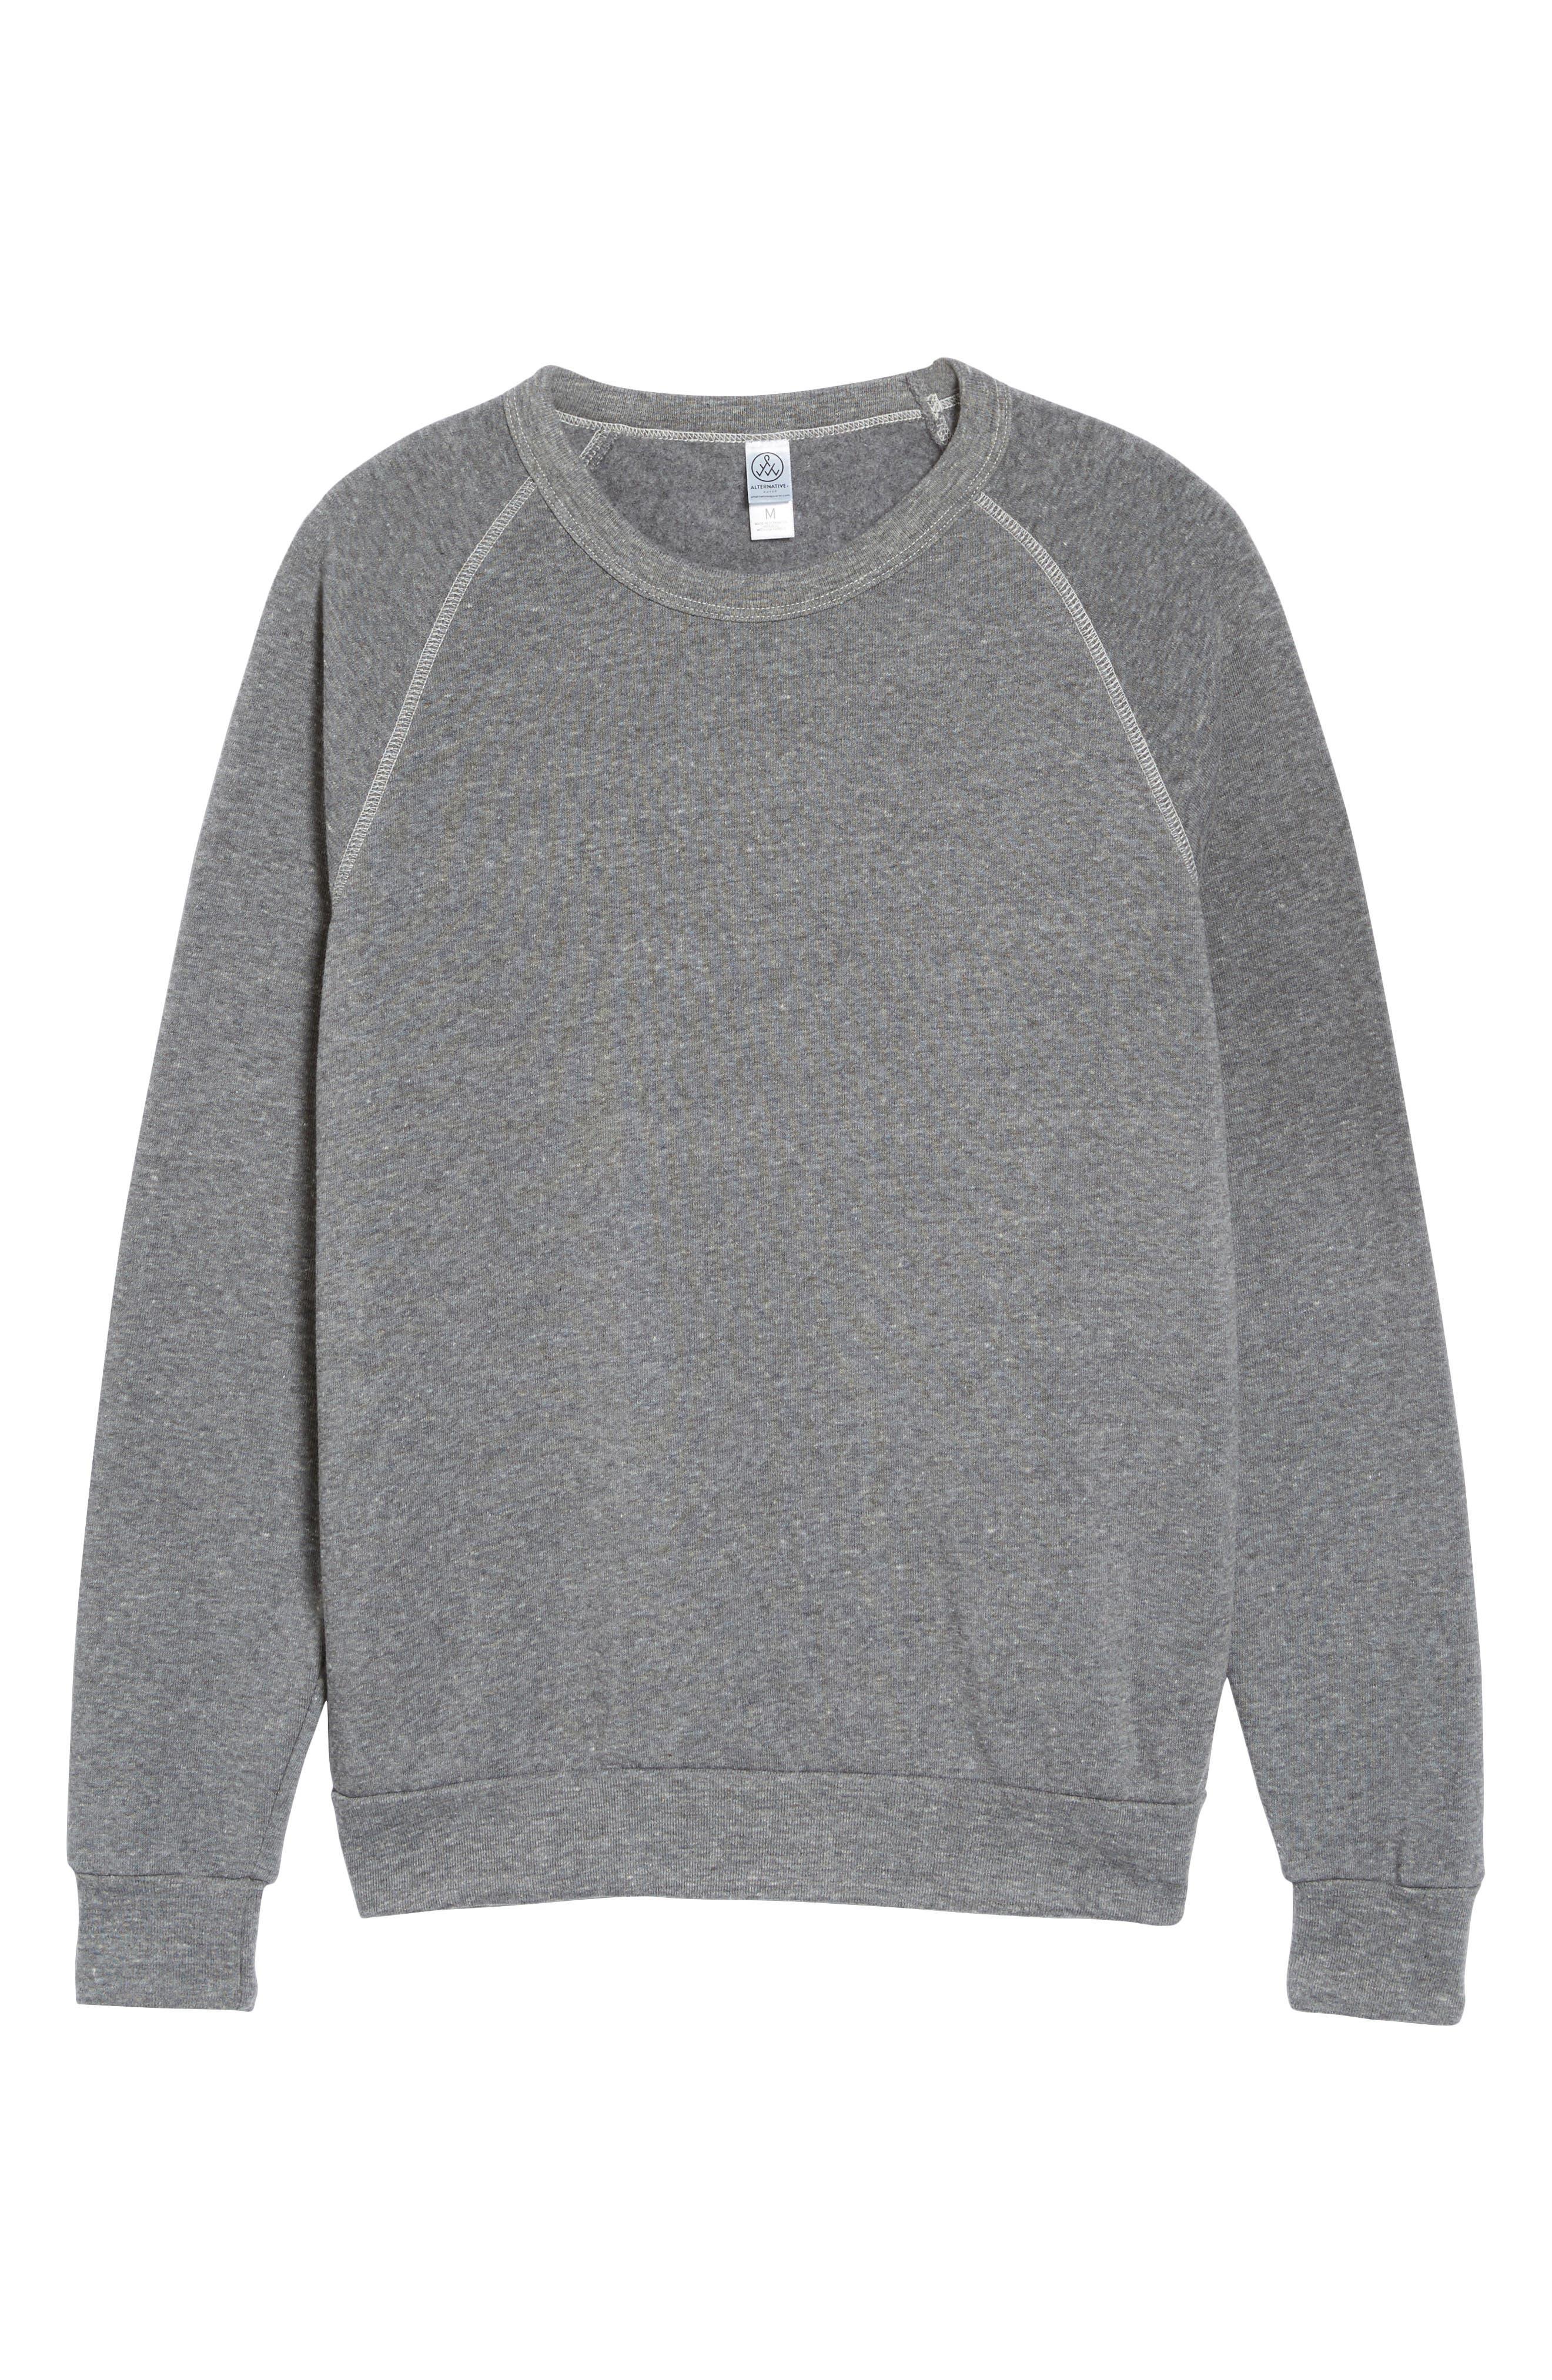 'The Champ' Sweatshirt,                             Alternate thumbnail 68, color,